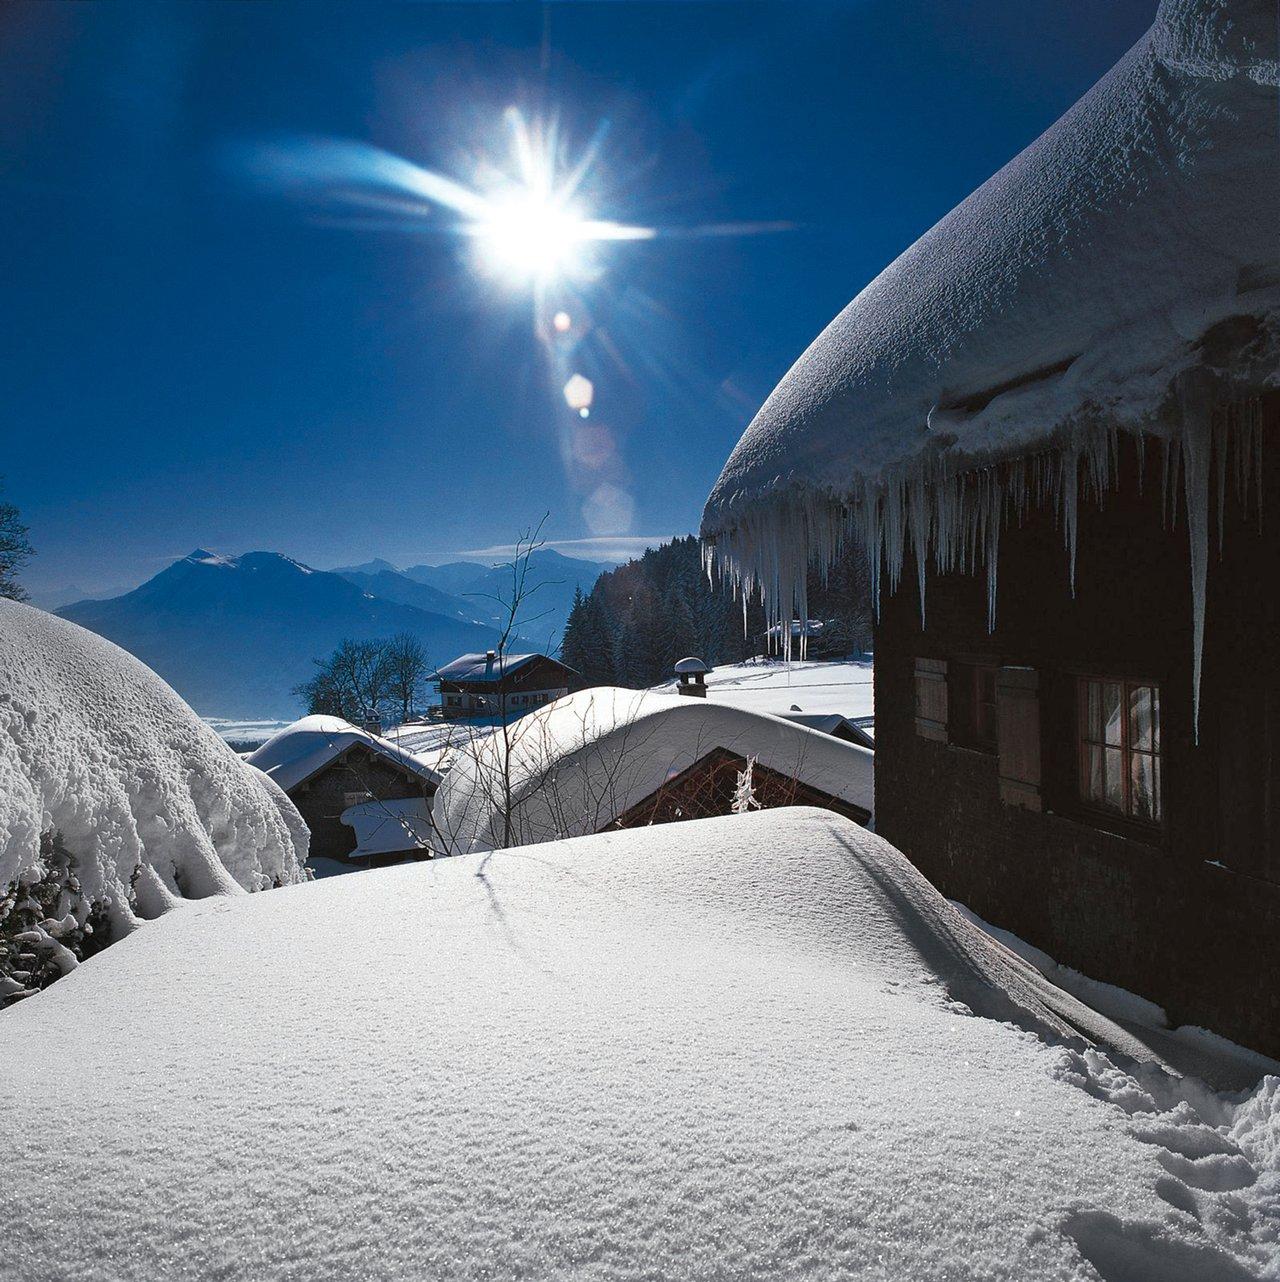 hpo_winter05_jpg_1280x5000_q85